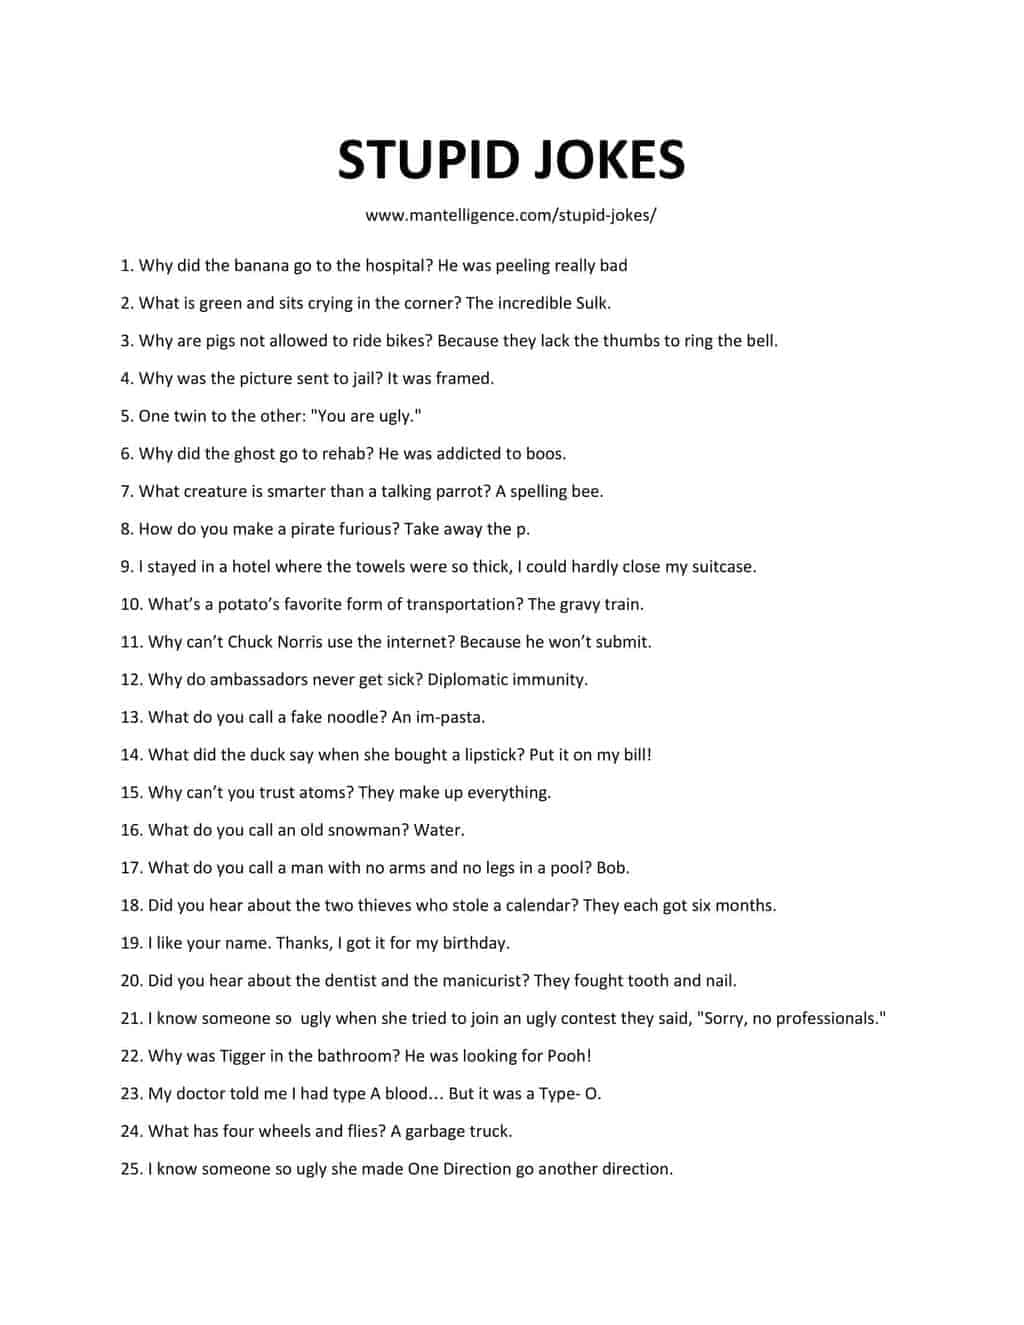 Downloadable and Printable List of Stupid Jokes as pdf or jpg